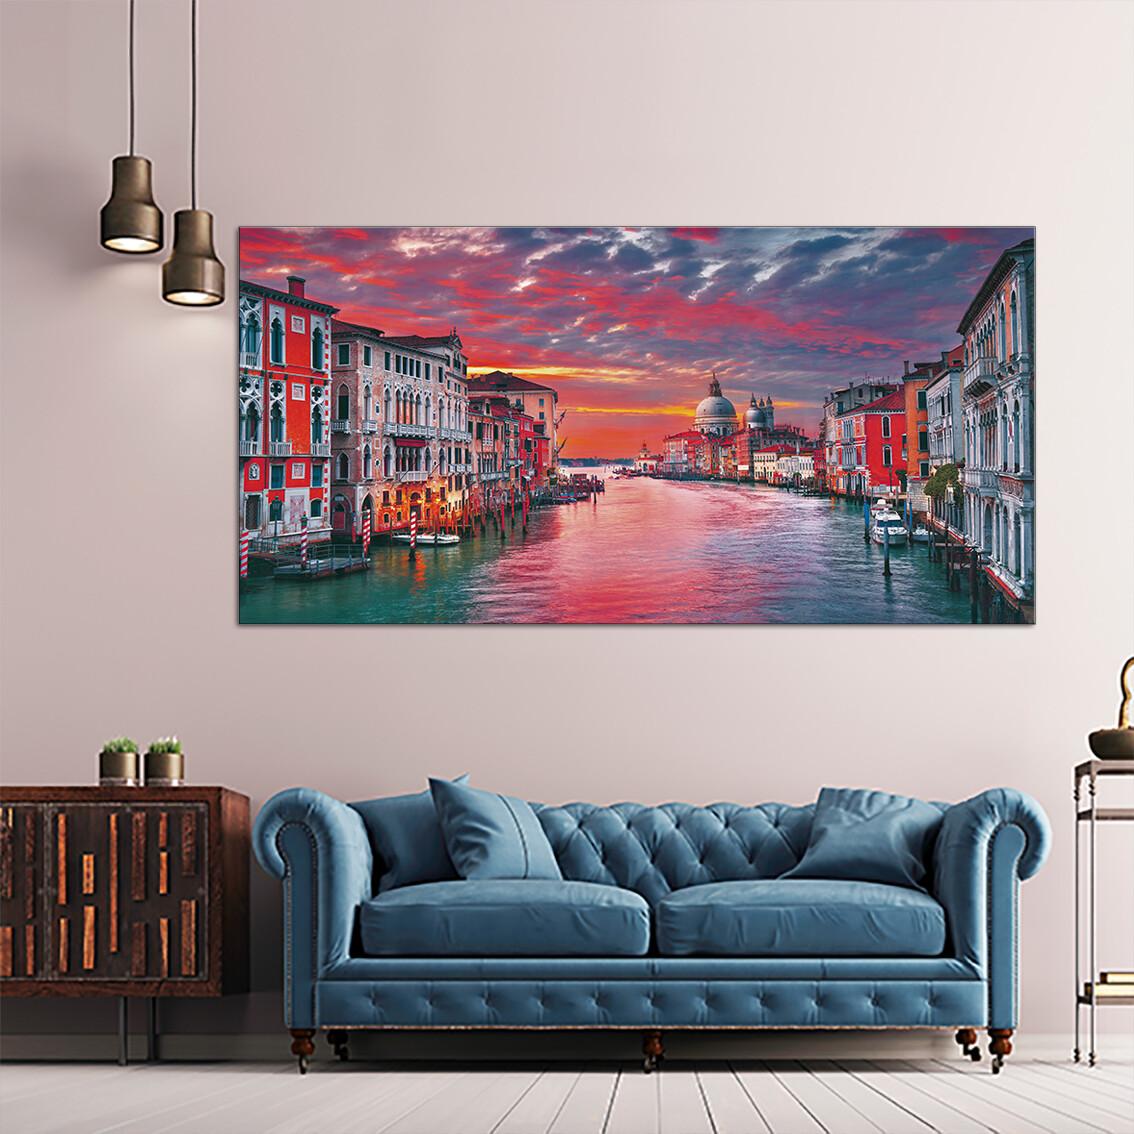 River Walk, Venice